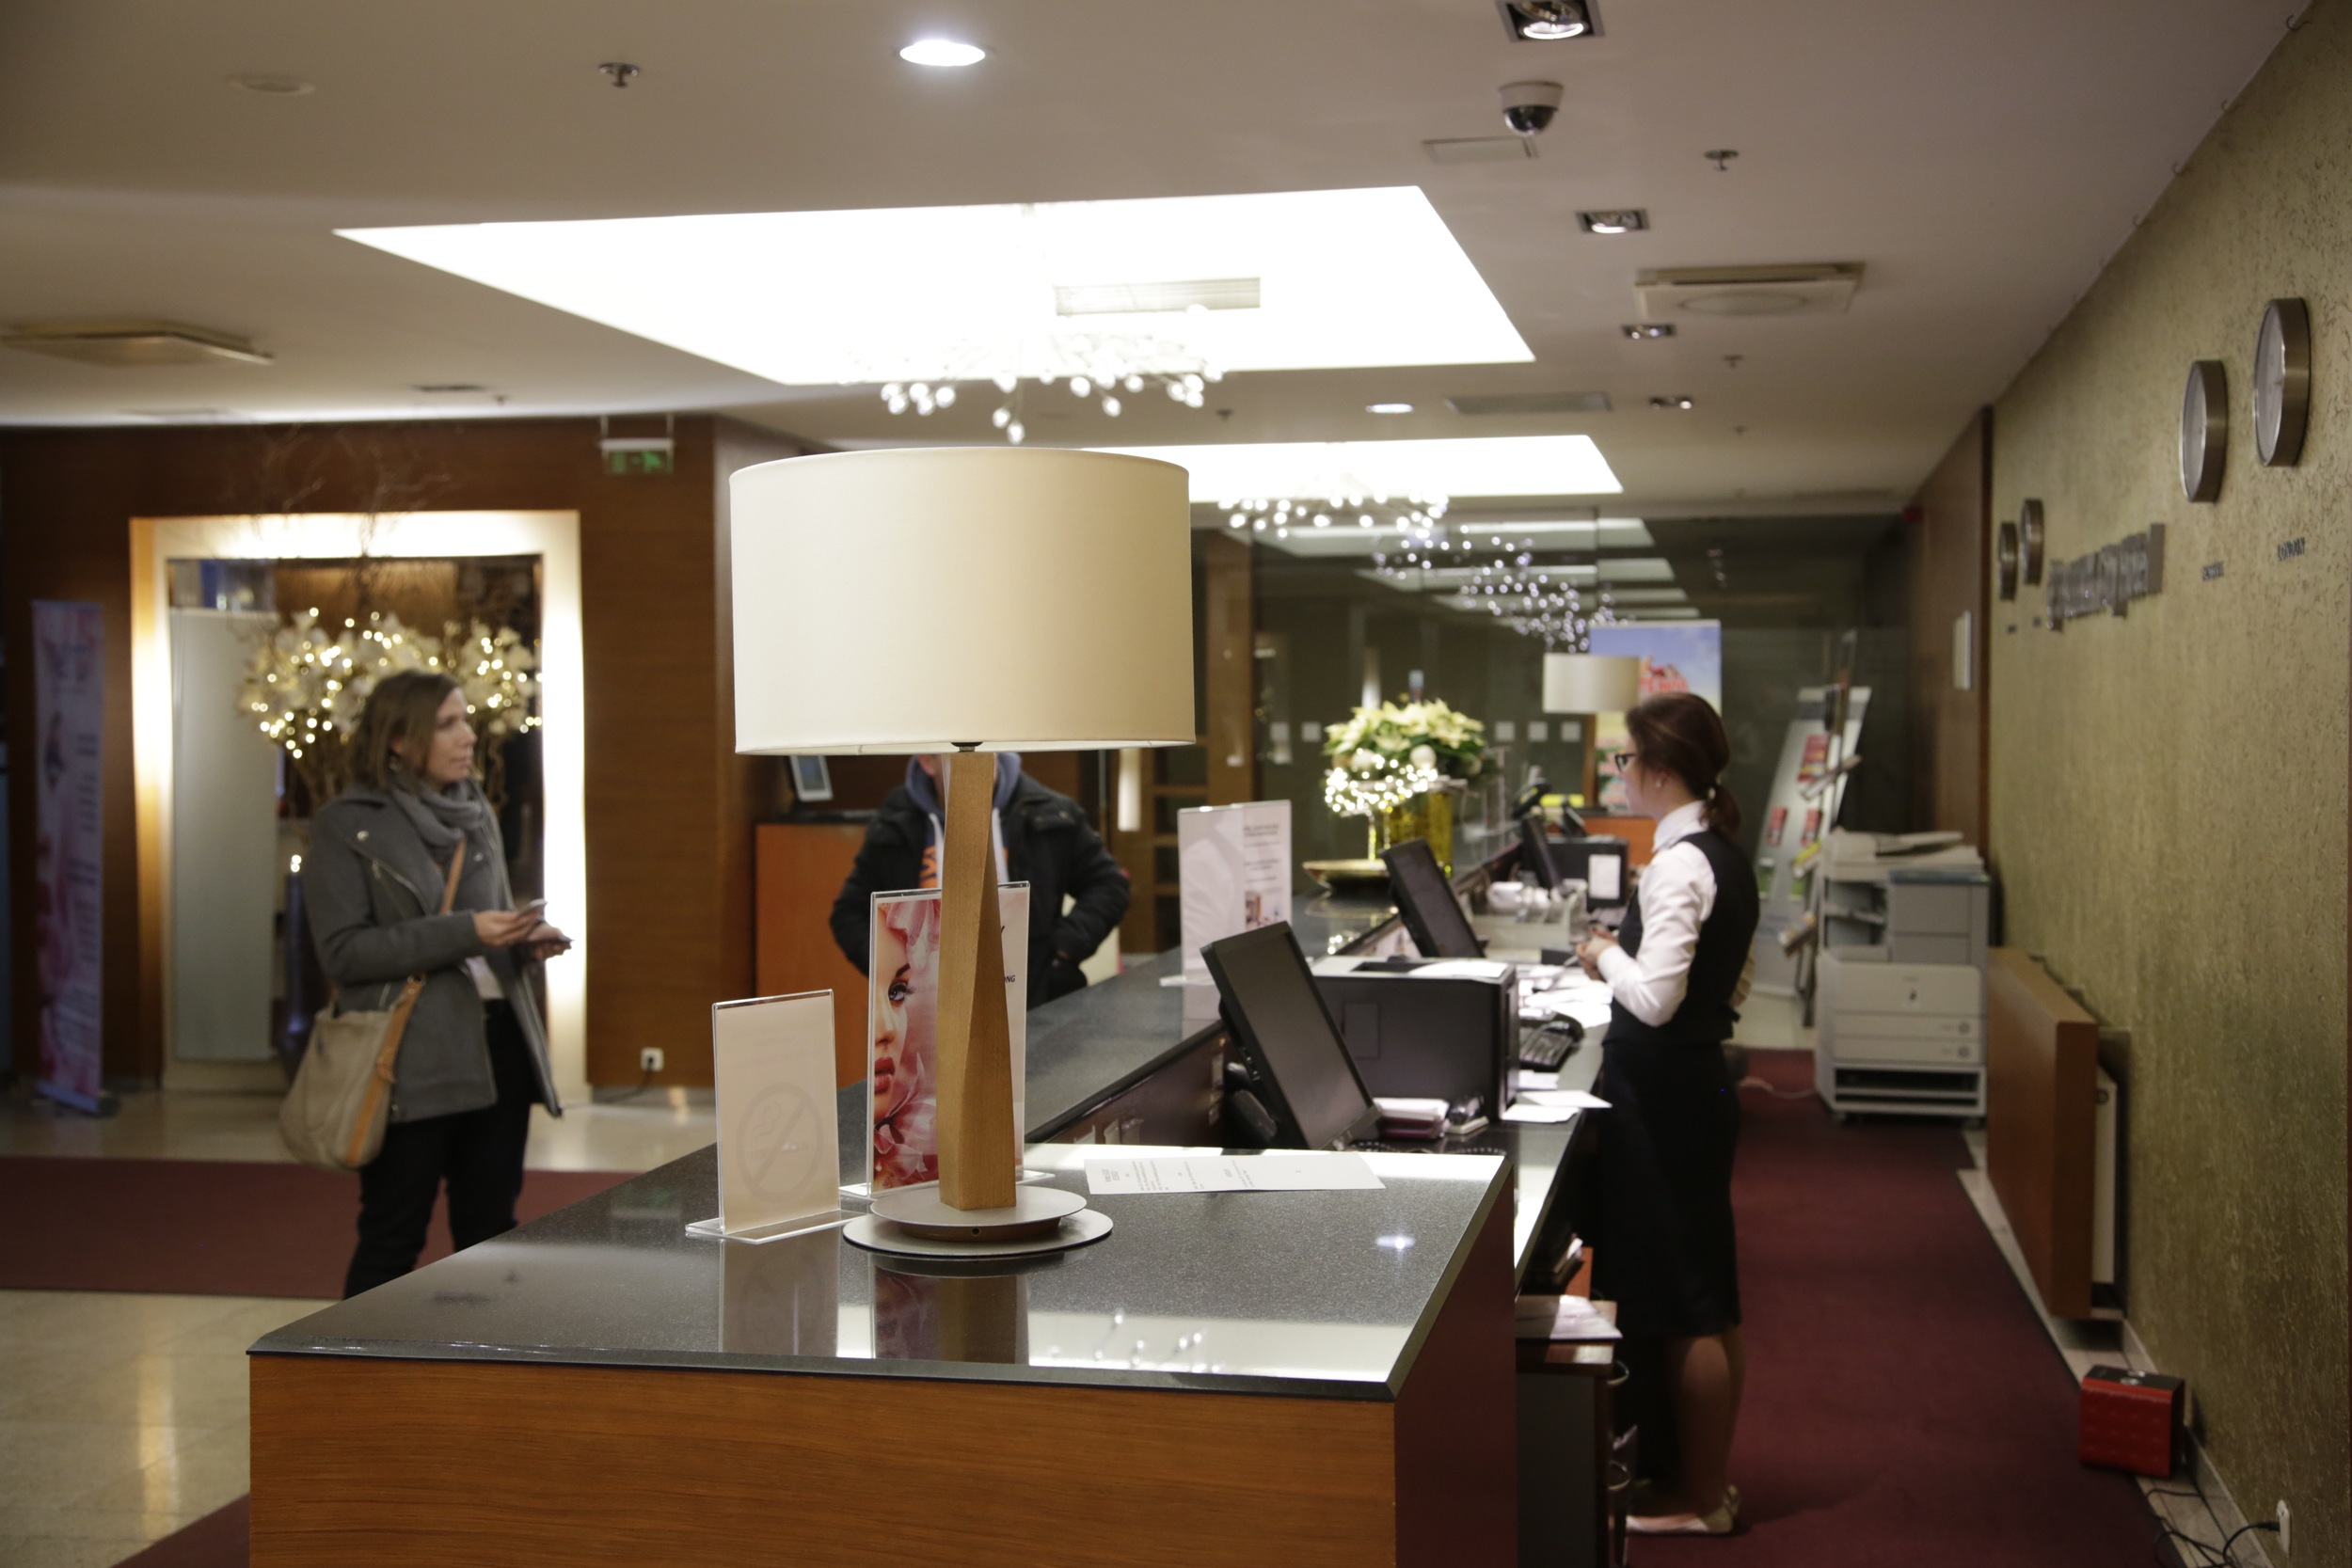 Hvordan booker du dine hotellrom?                 Foto: Odd Roar Lange